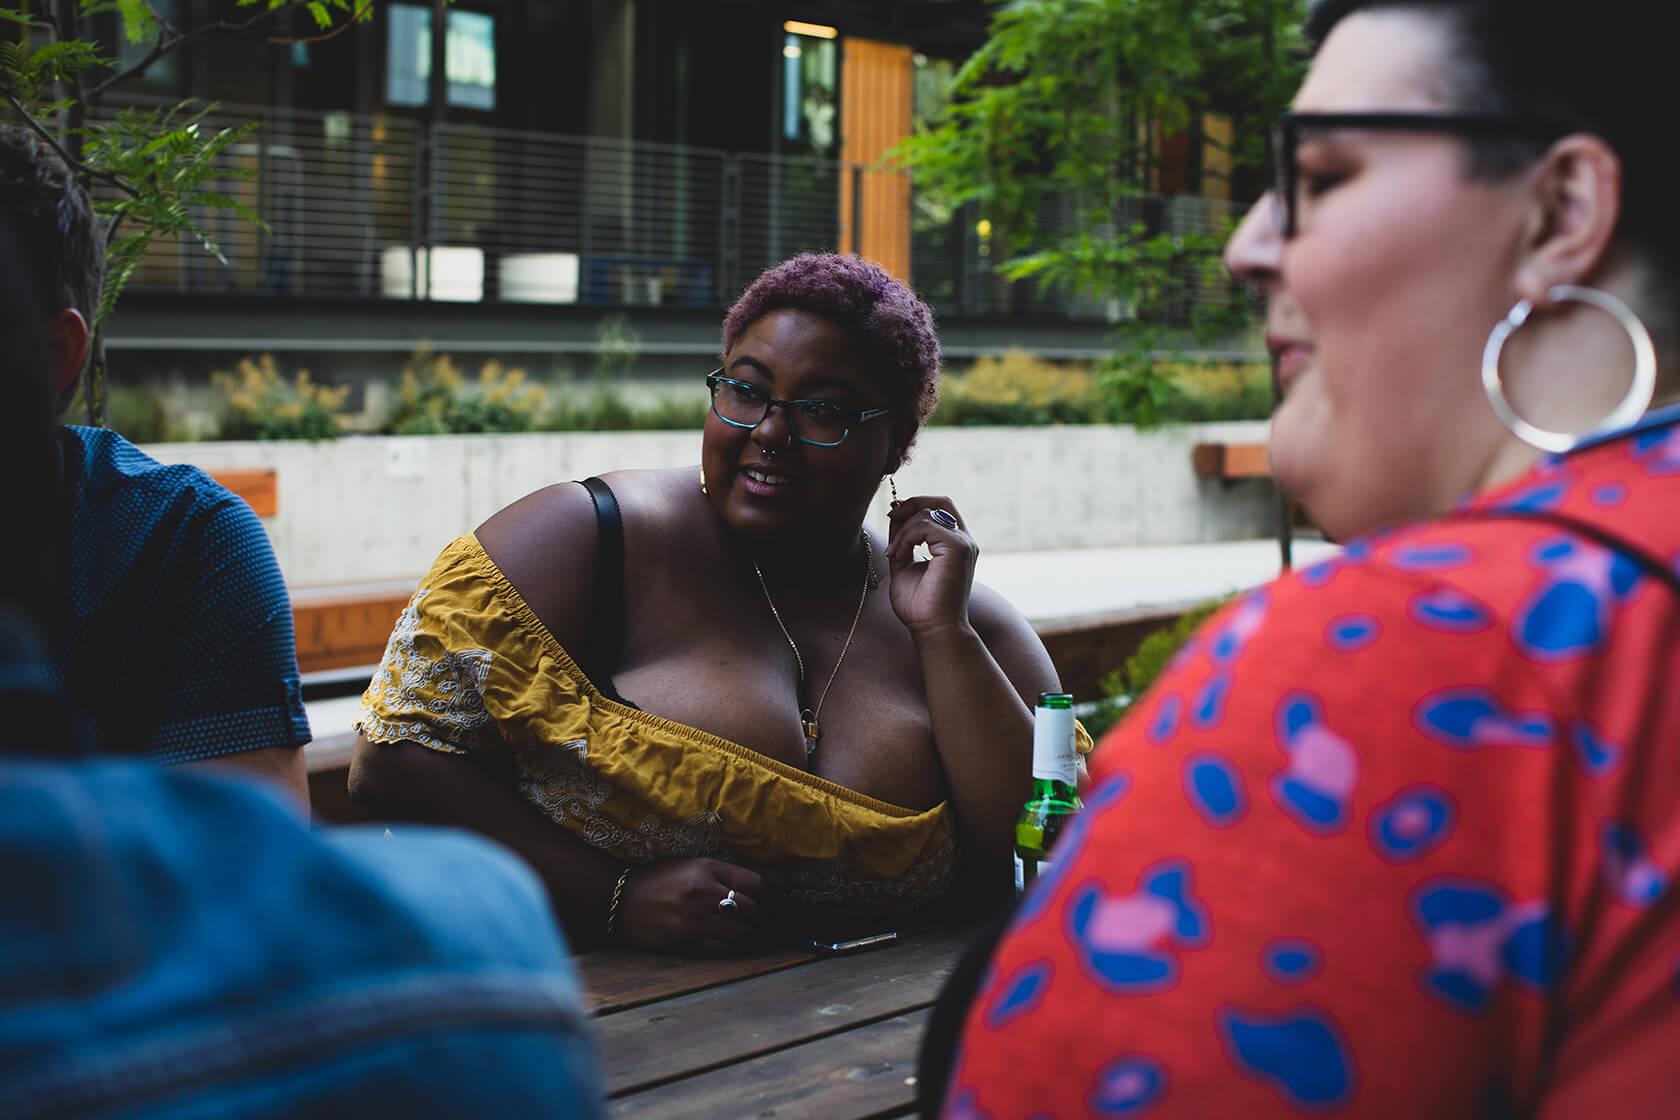 oversized women conversing outside